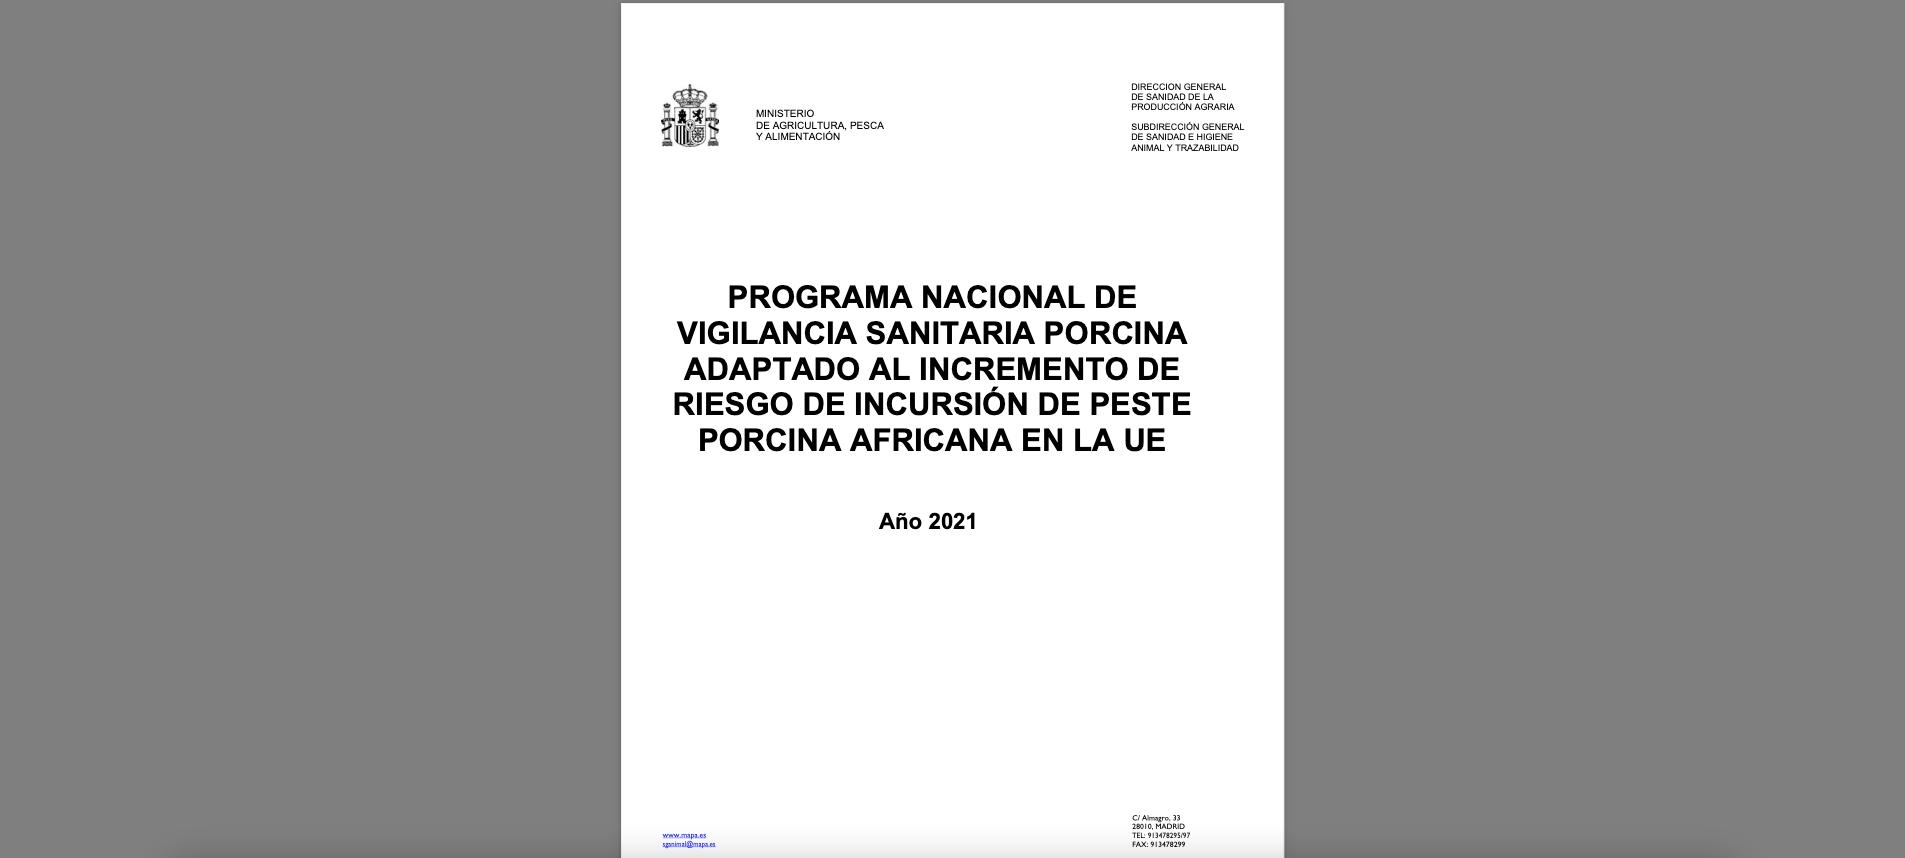 programa nacional de vigilancia sanitaria porcina